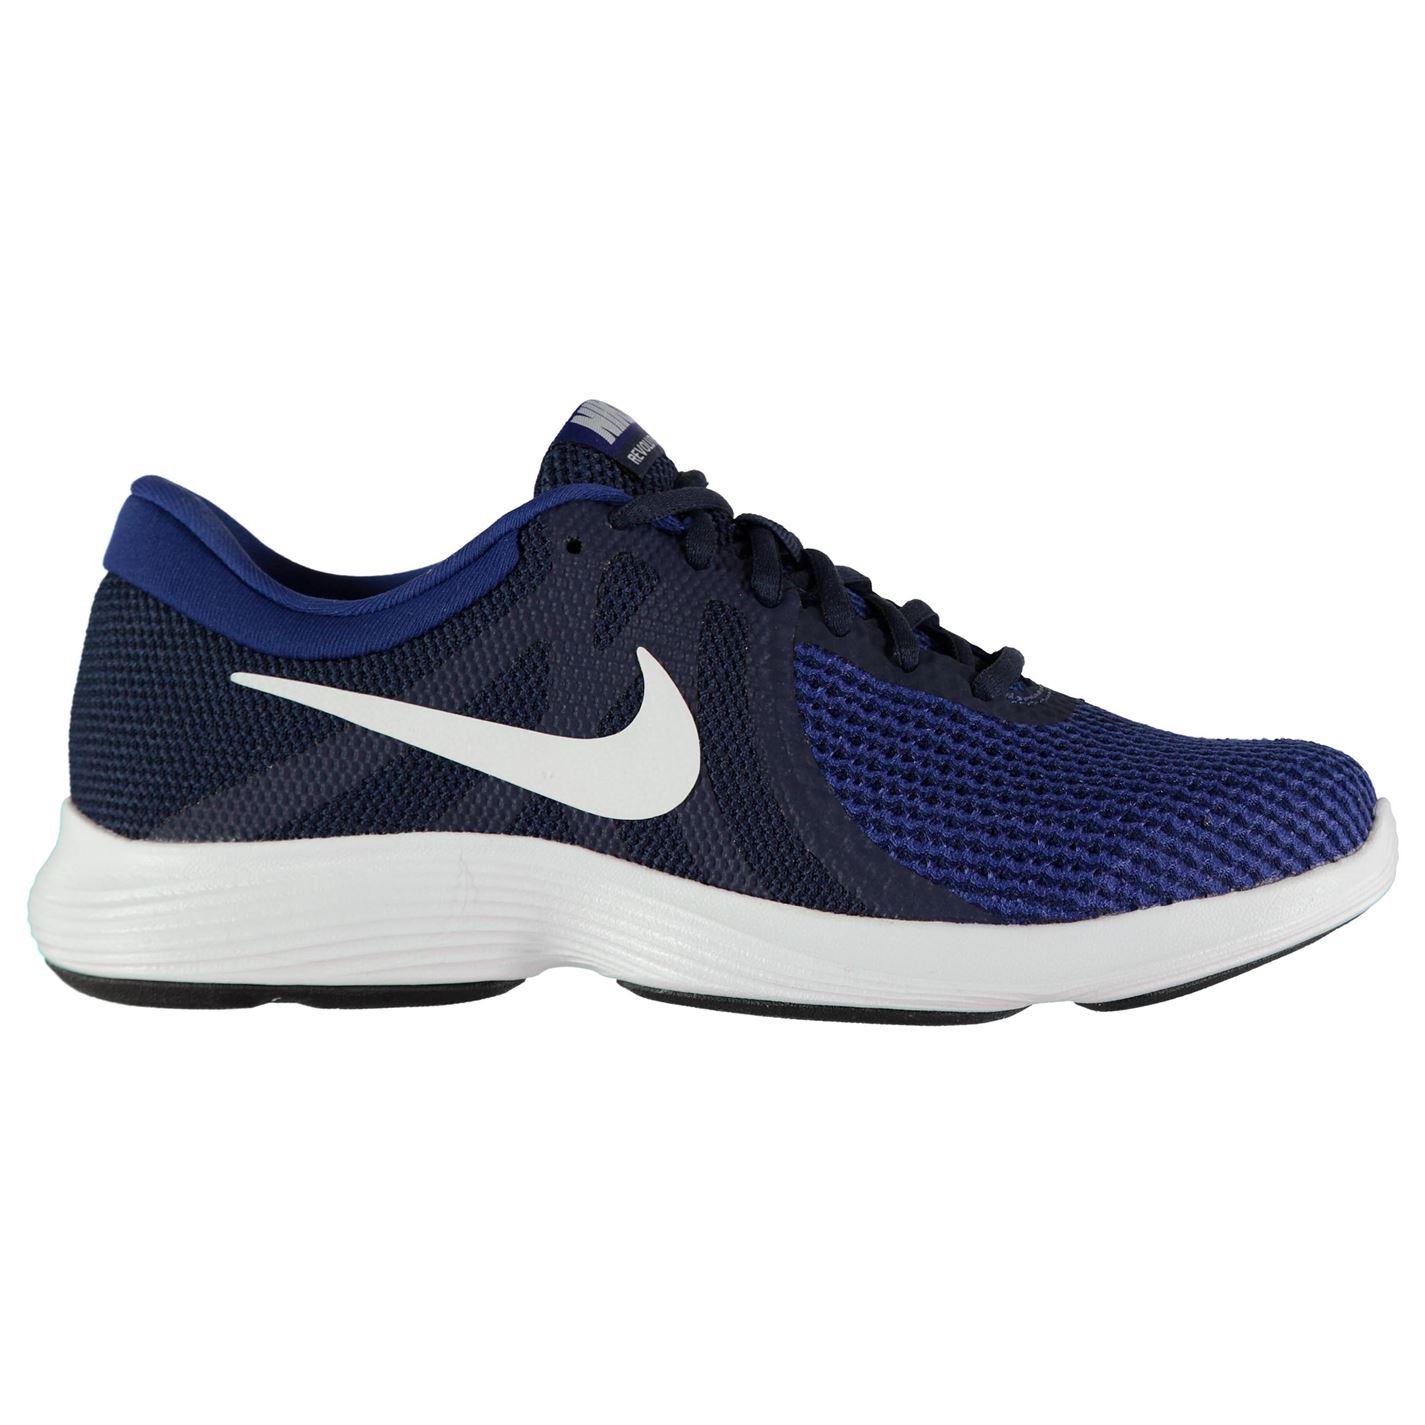 Nike Revolution 4 Pánské tenisky - Glami.sk 815e8366e9f